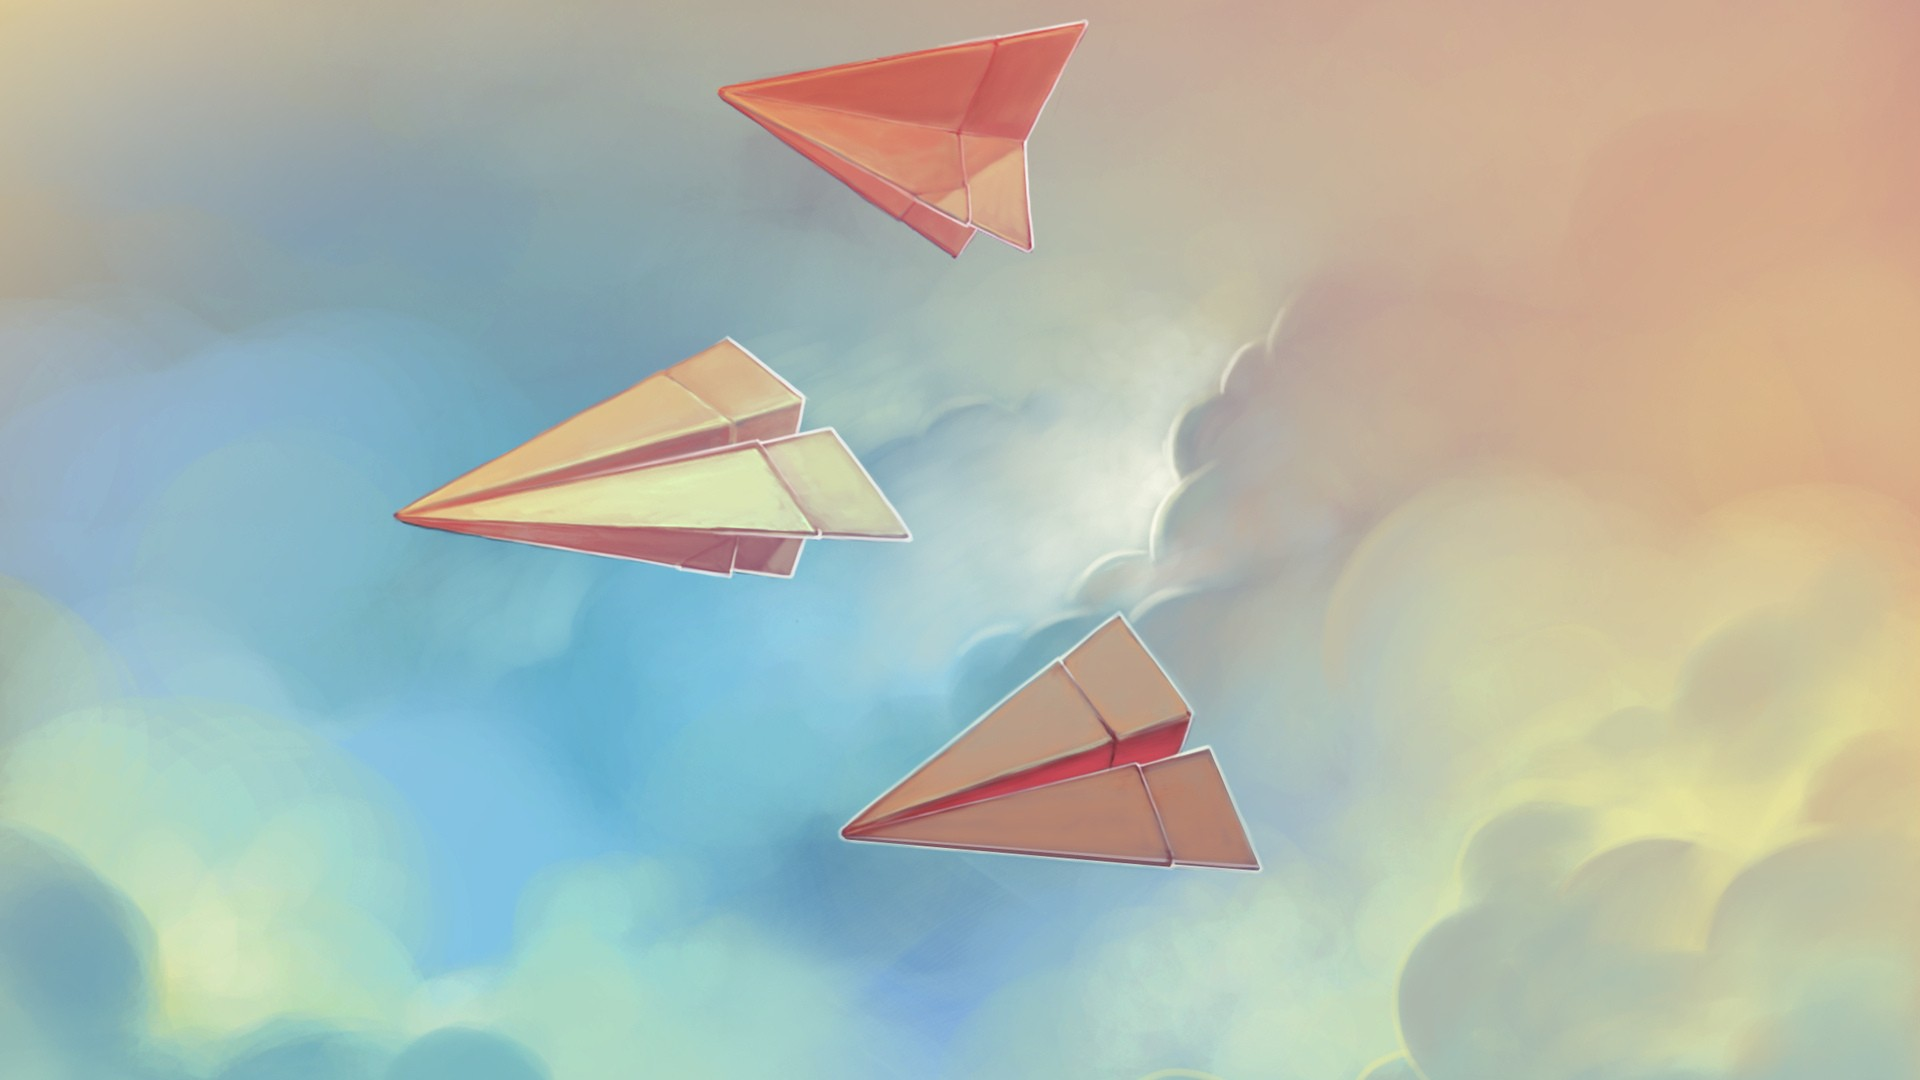 Paper Airplane nice wallpaper